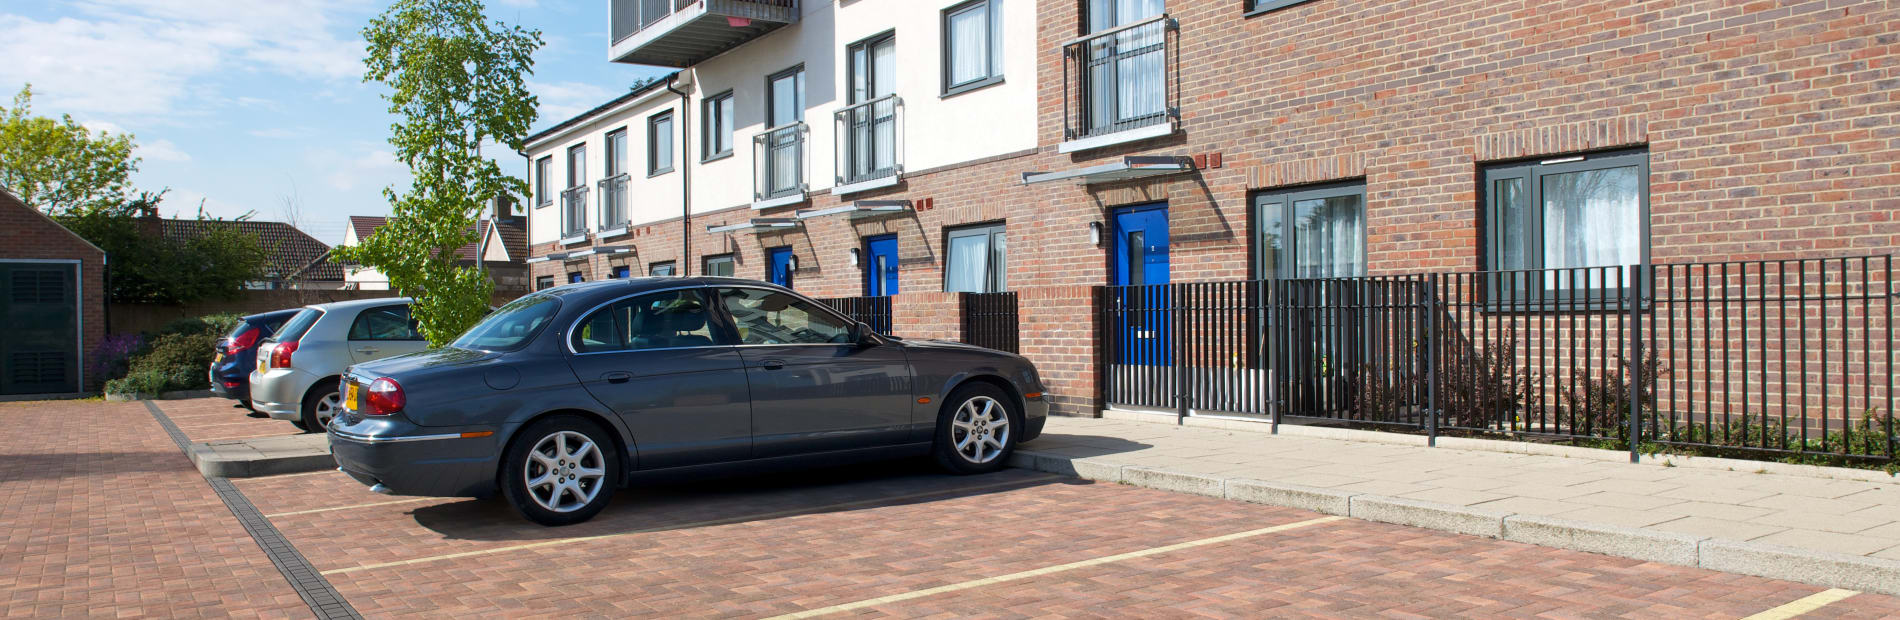 drexus driveline drain insitu car park housing estate